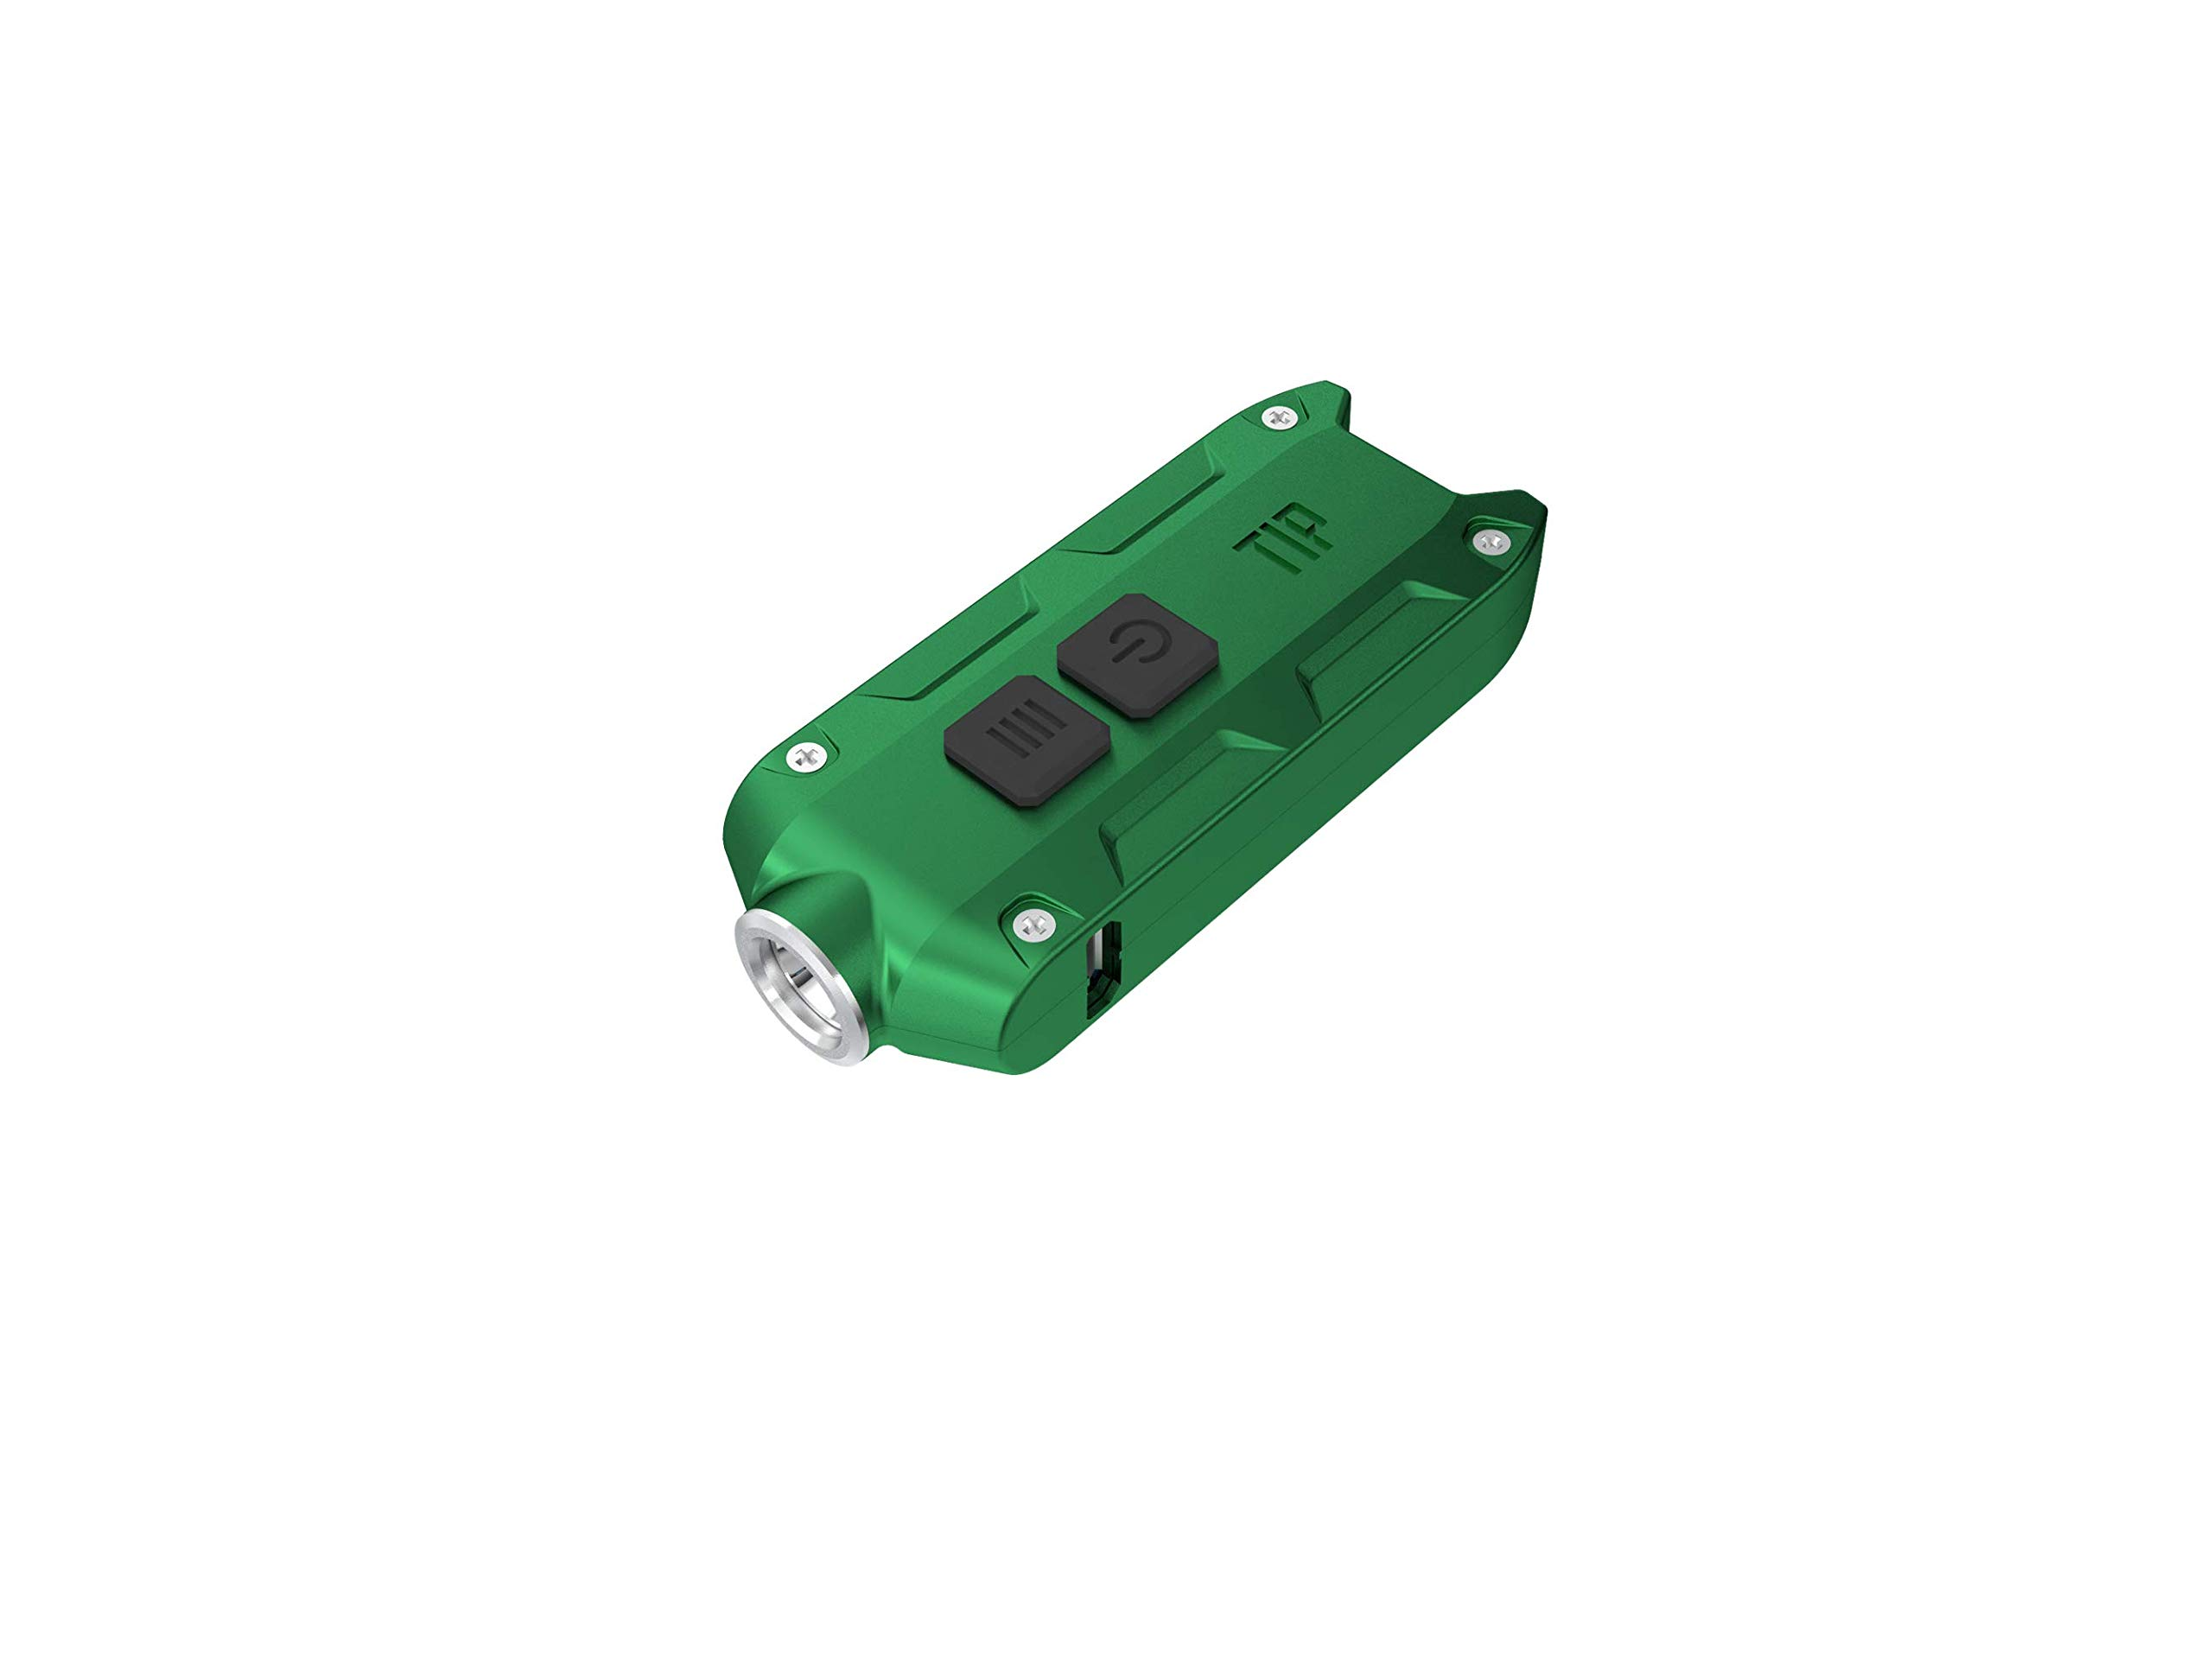 Linternas : Nitecore Tip 360 Lumens Light USB Recharg. Verde